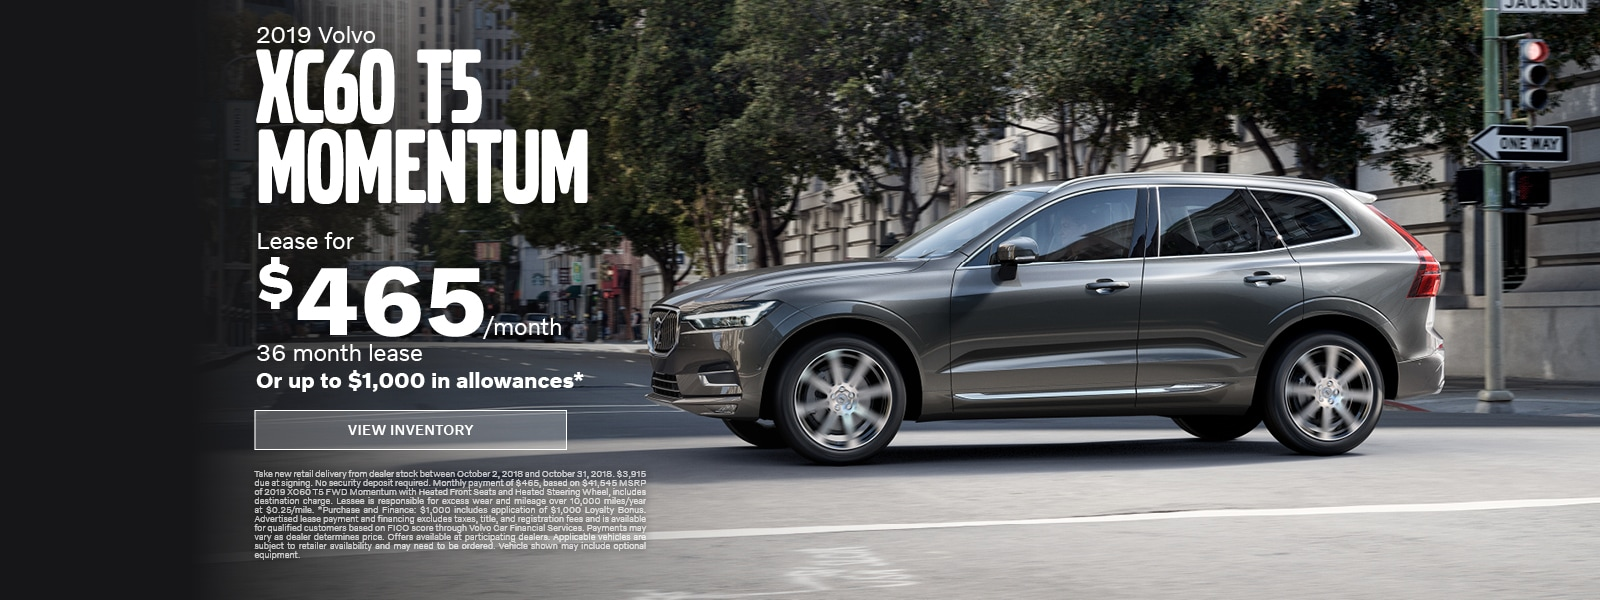 Volvo Cars of Santa Monica New 2018-2019 Volvo & Used Car Dealership | Auto Financing, Parts ...